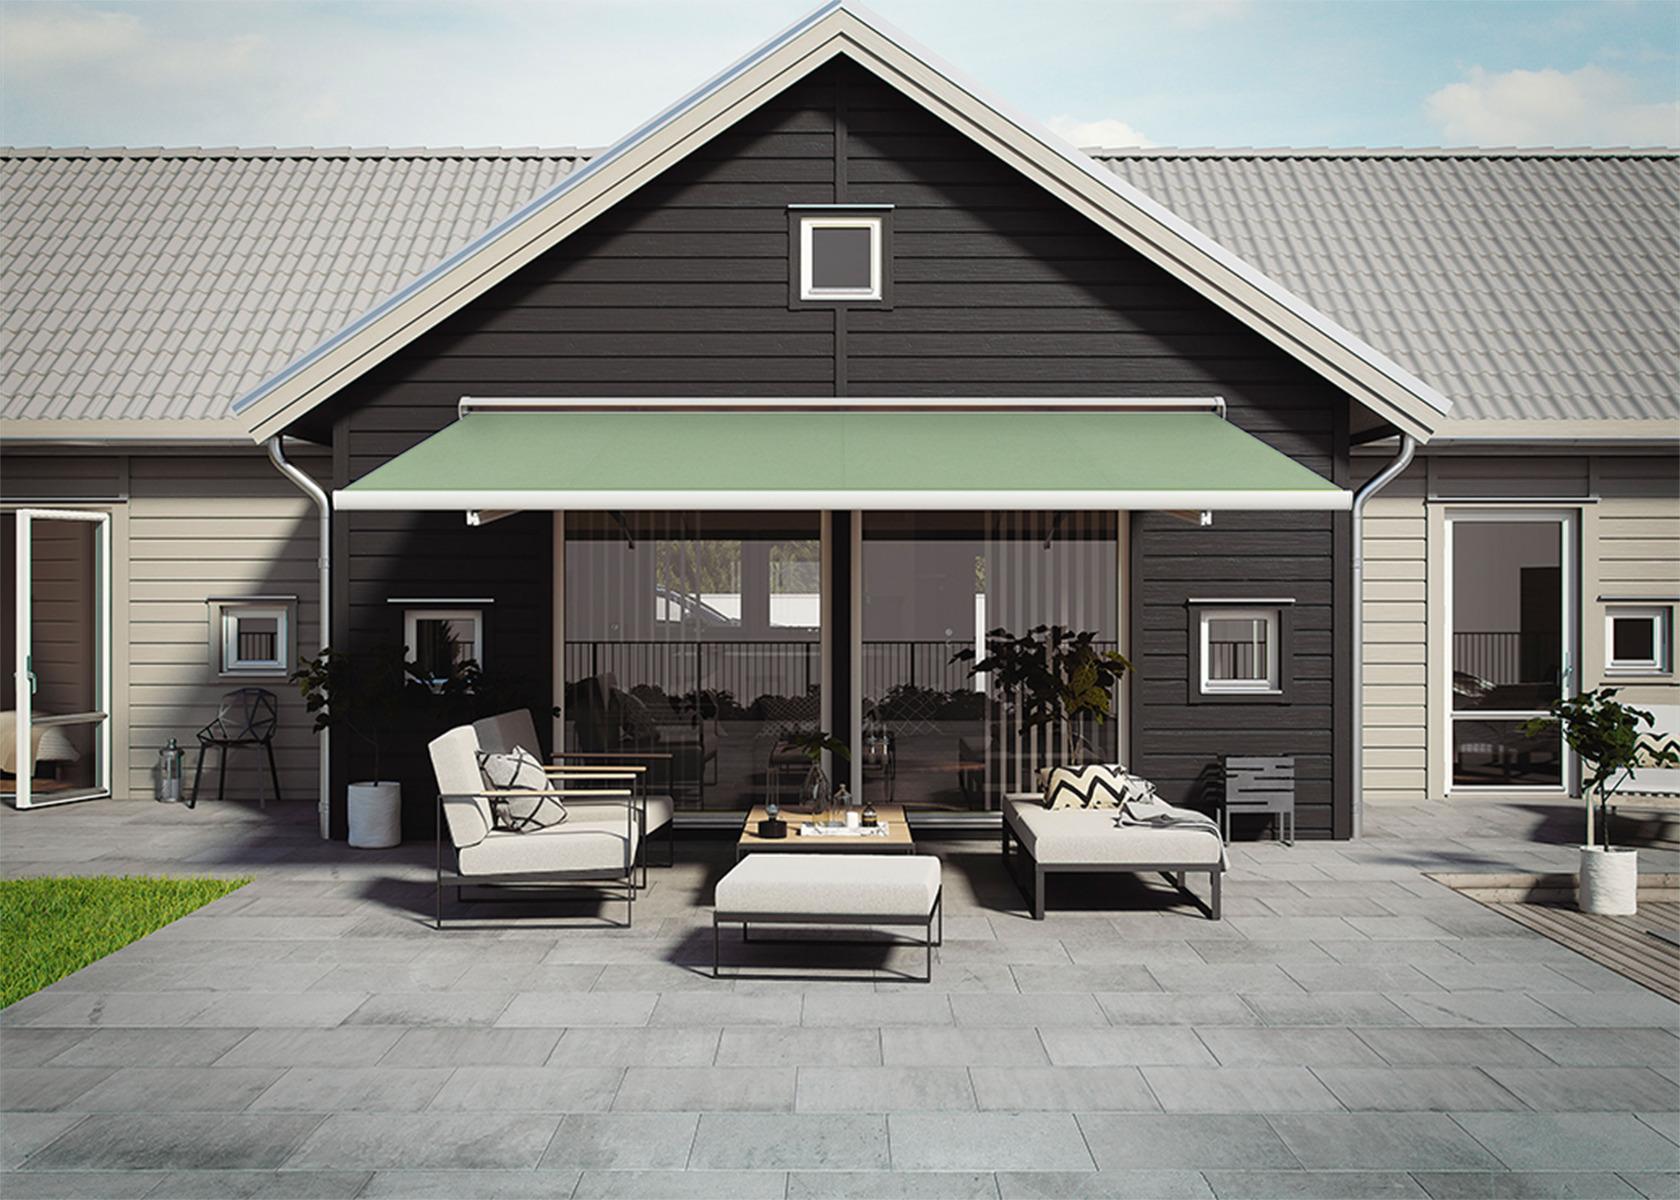 Grön terrassmarkis